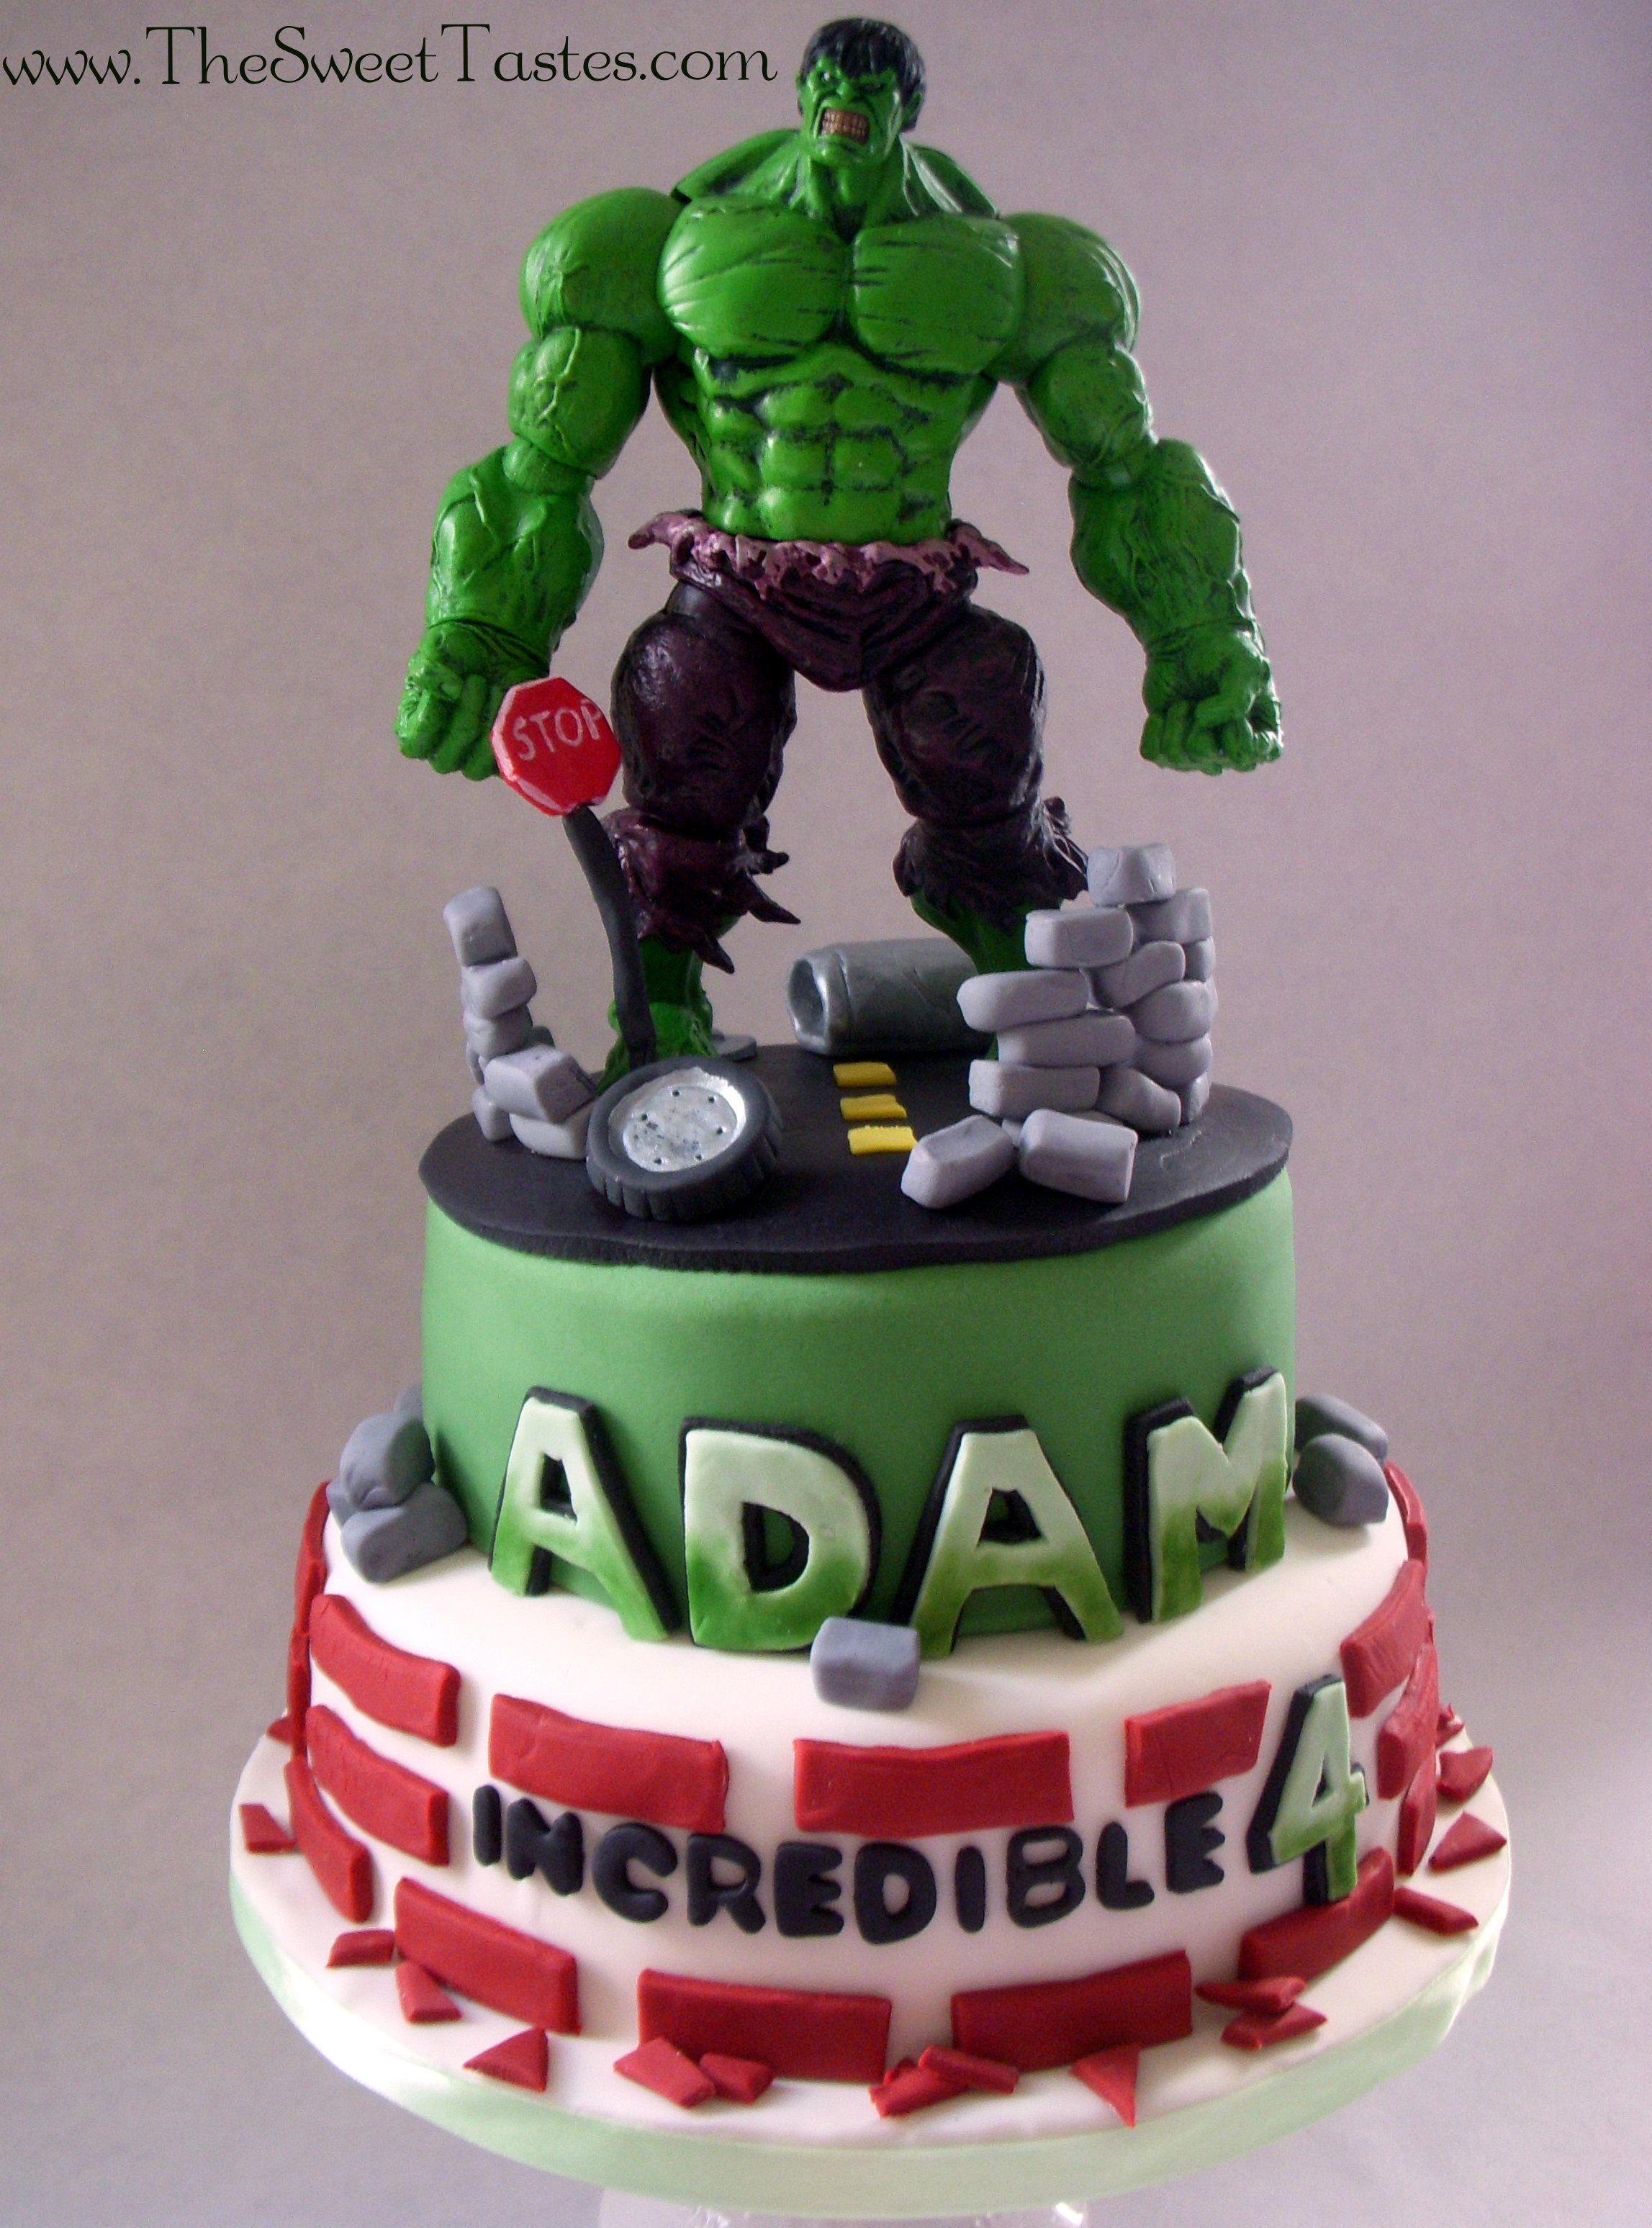 Incredible Hulk Cake Decorations